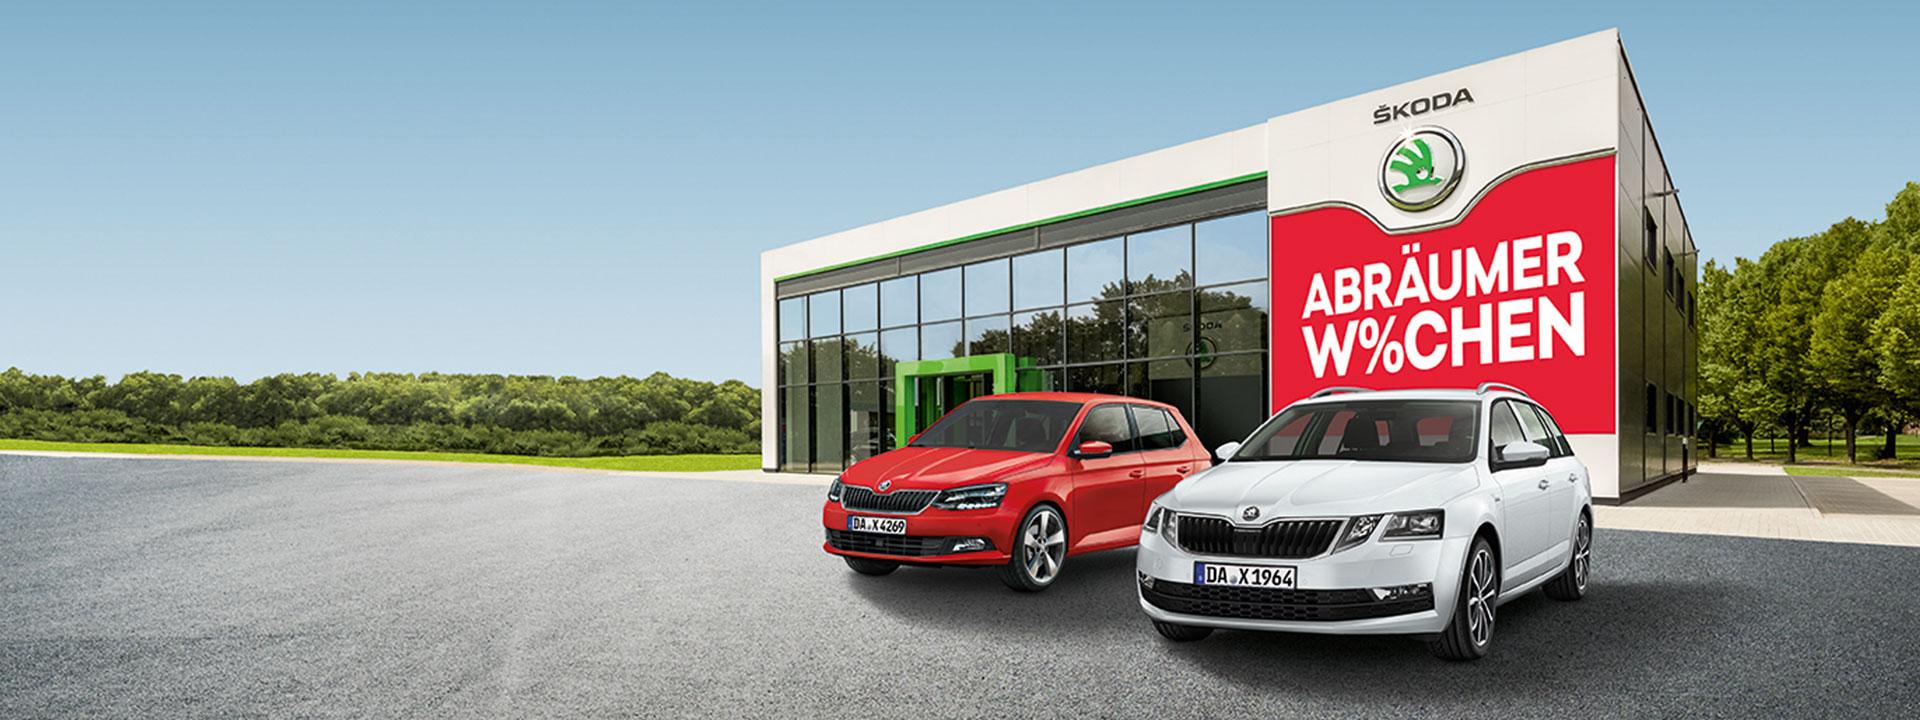 Škoda Fabia und Škoda Octavia | Introbild